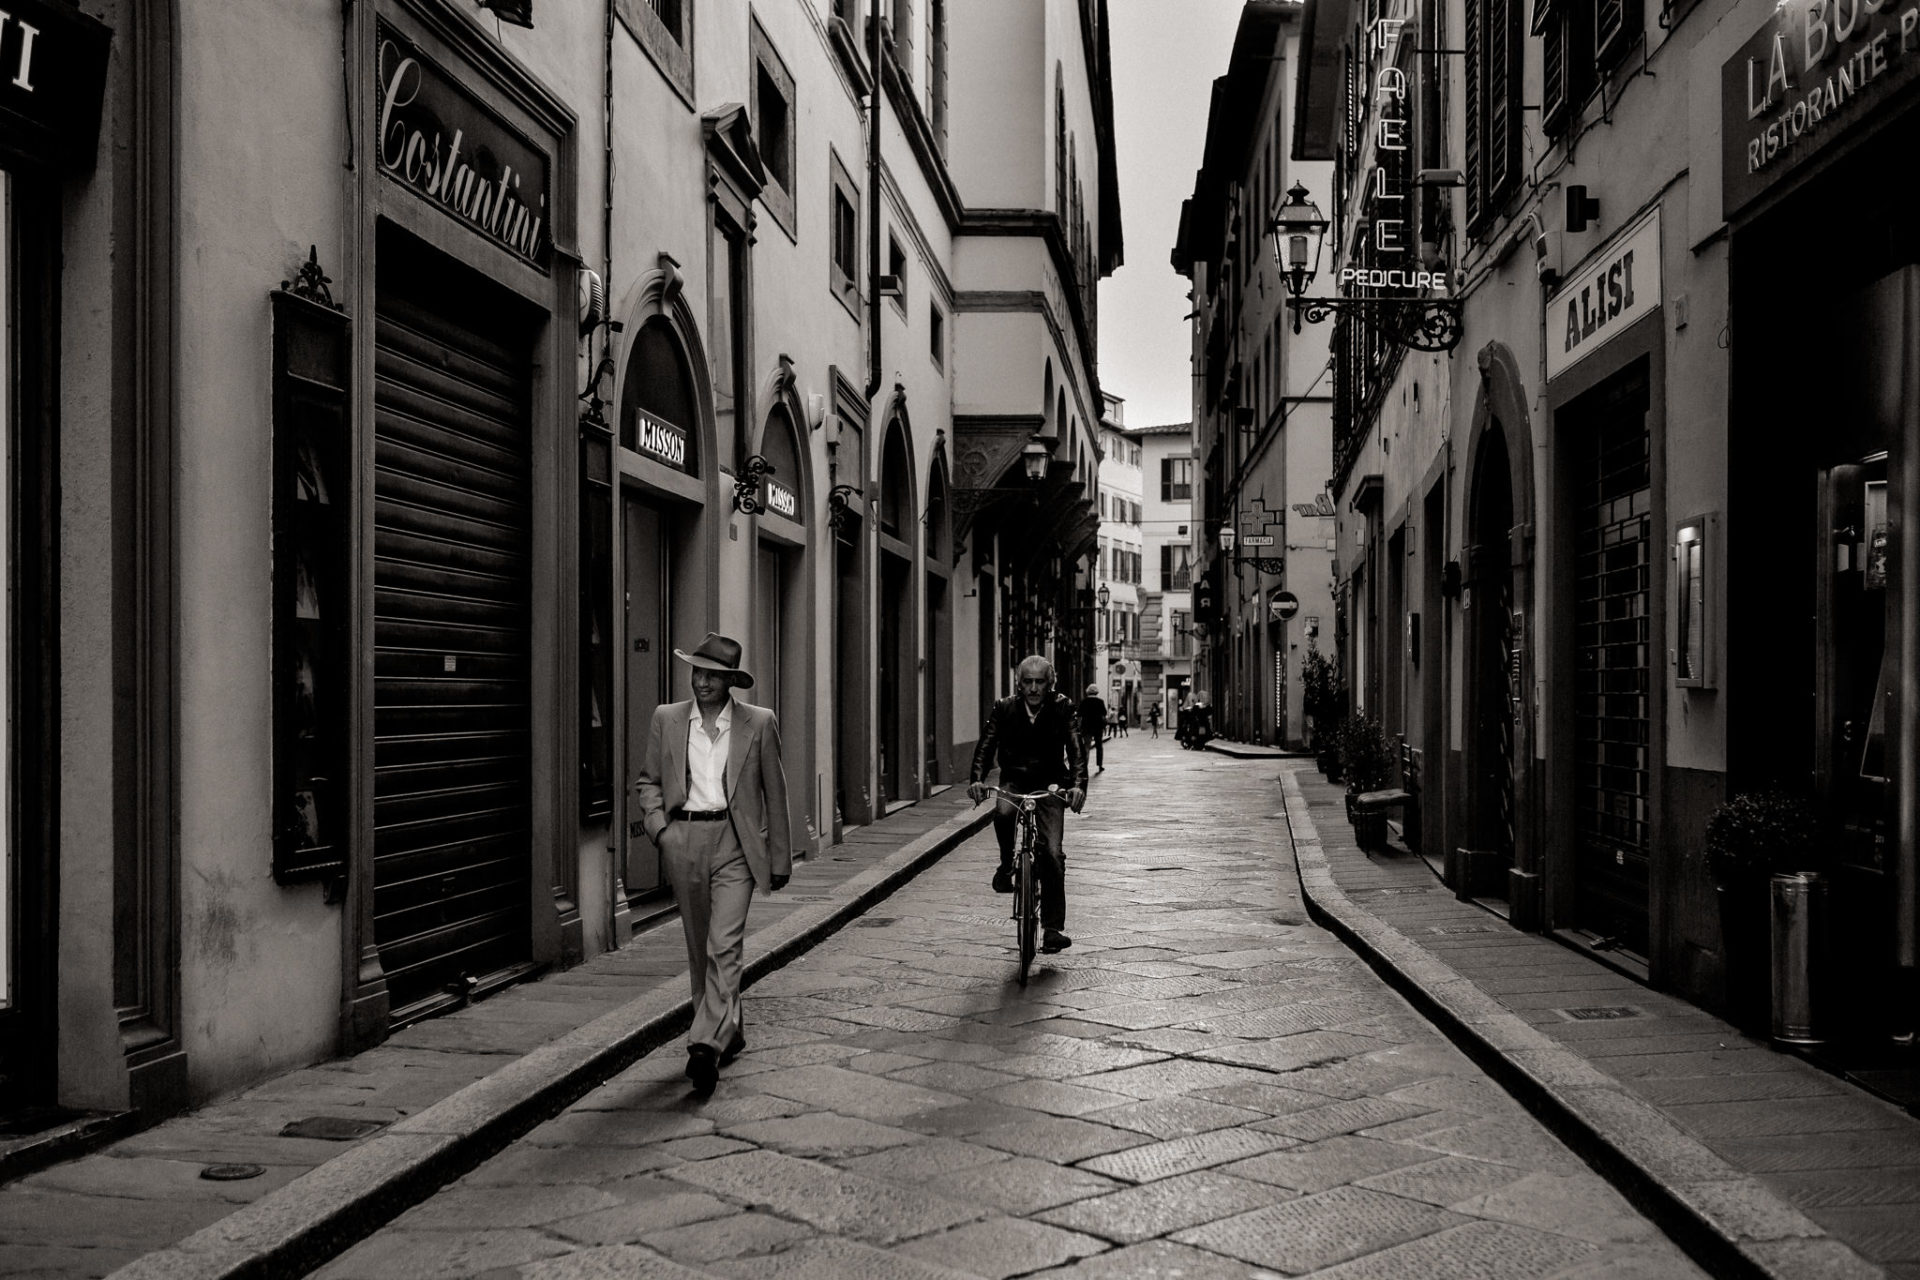 wedding photographer tuscany-italy road trip with dog-explore florence-italian vibes